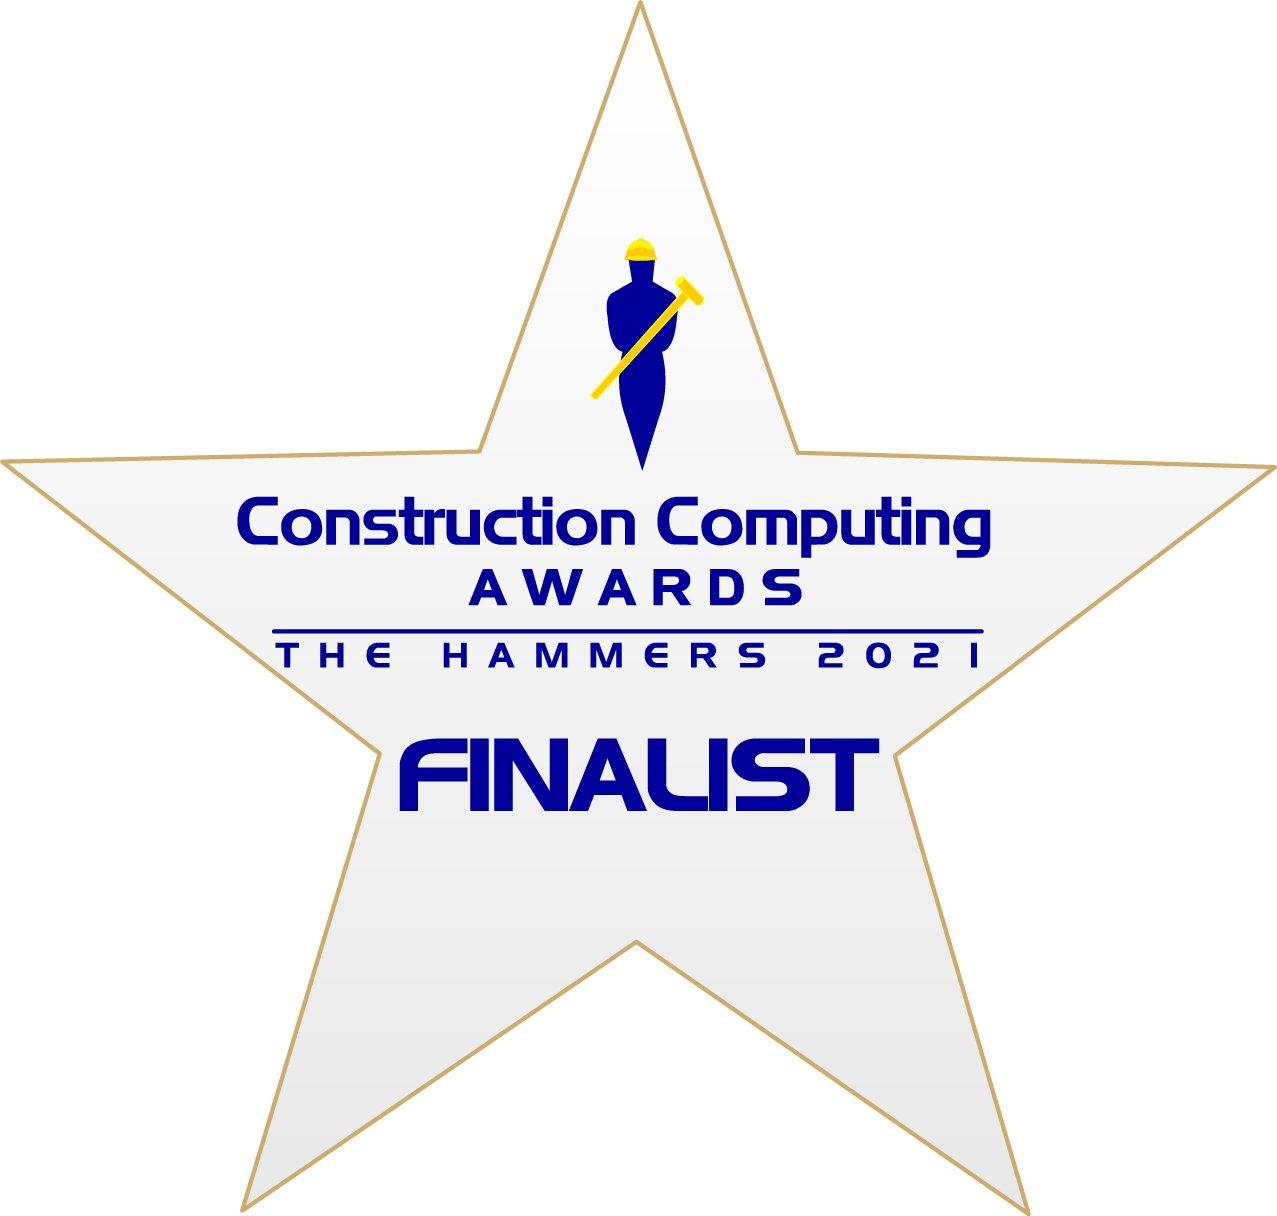 CC AWARD finalist 2021 (1)